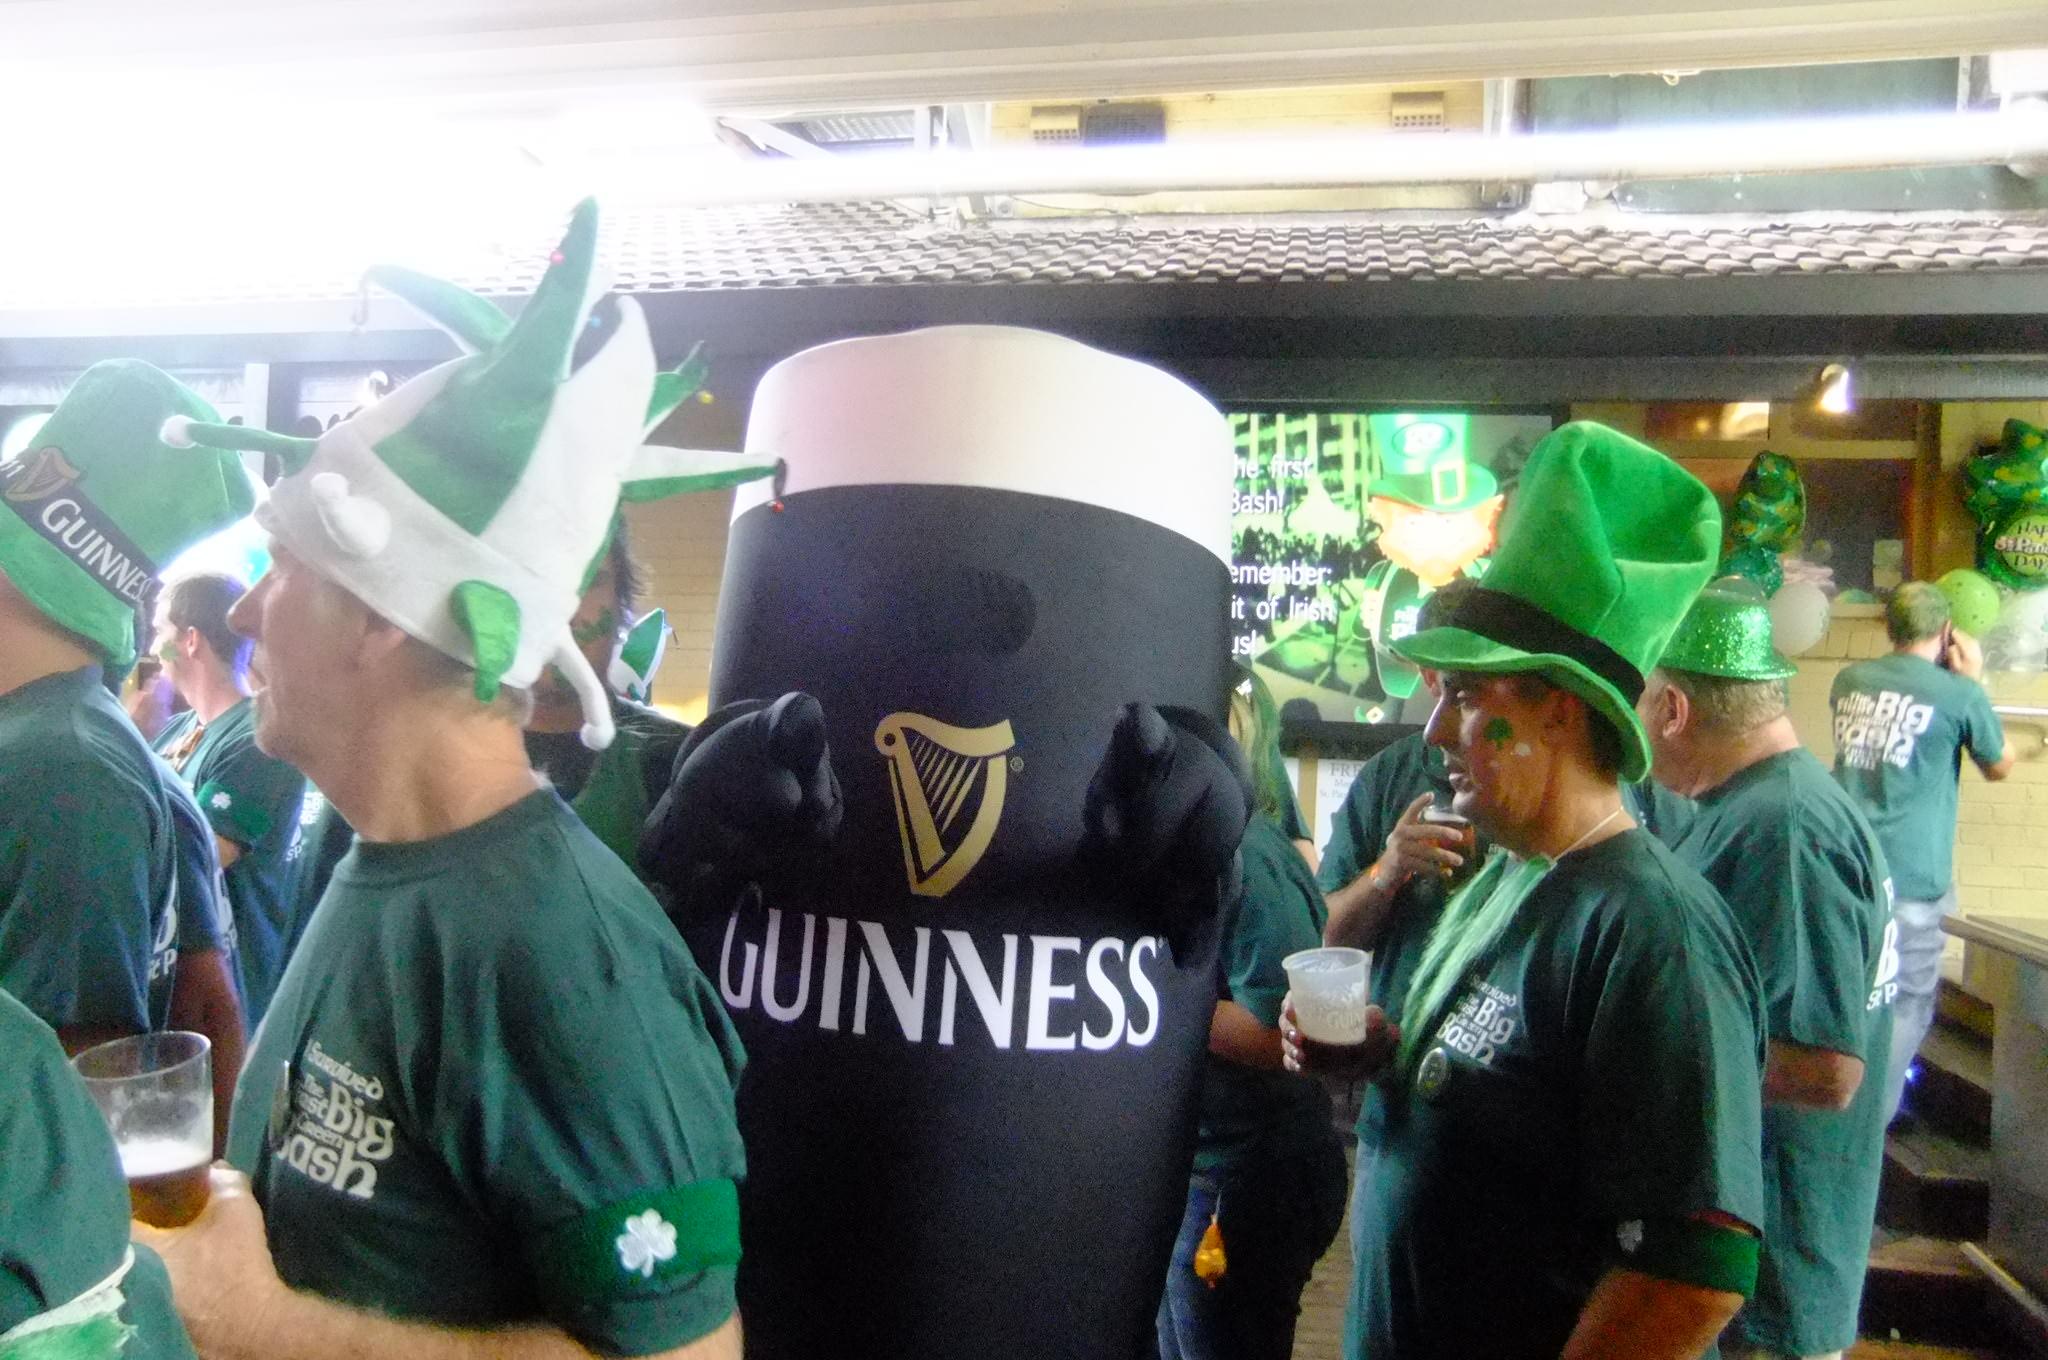 Jonny Blair dressed as a Guinness pint